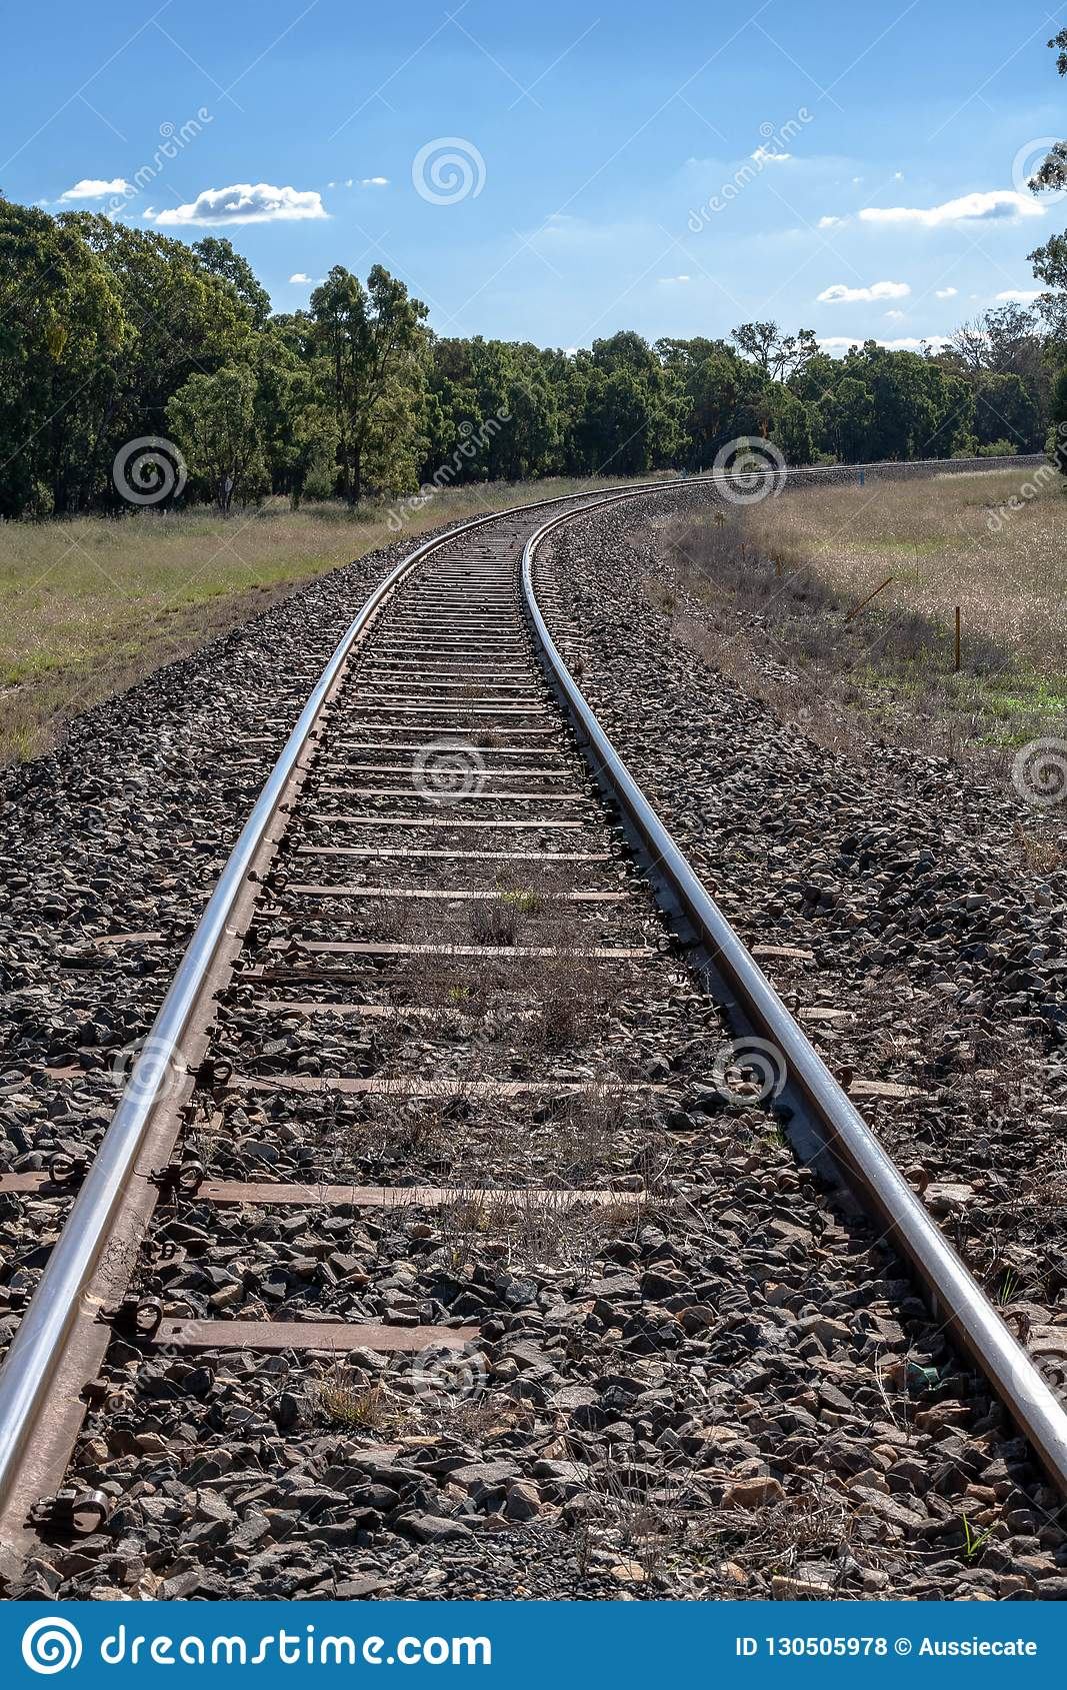 Railway tracks closeup from NSW Australia